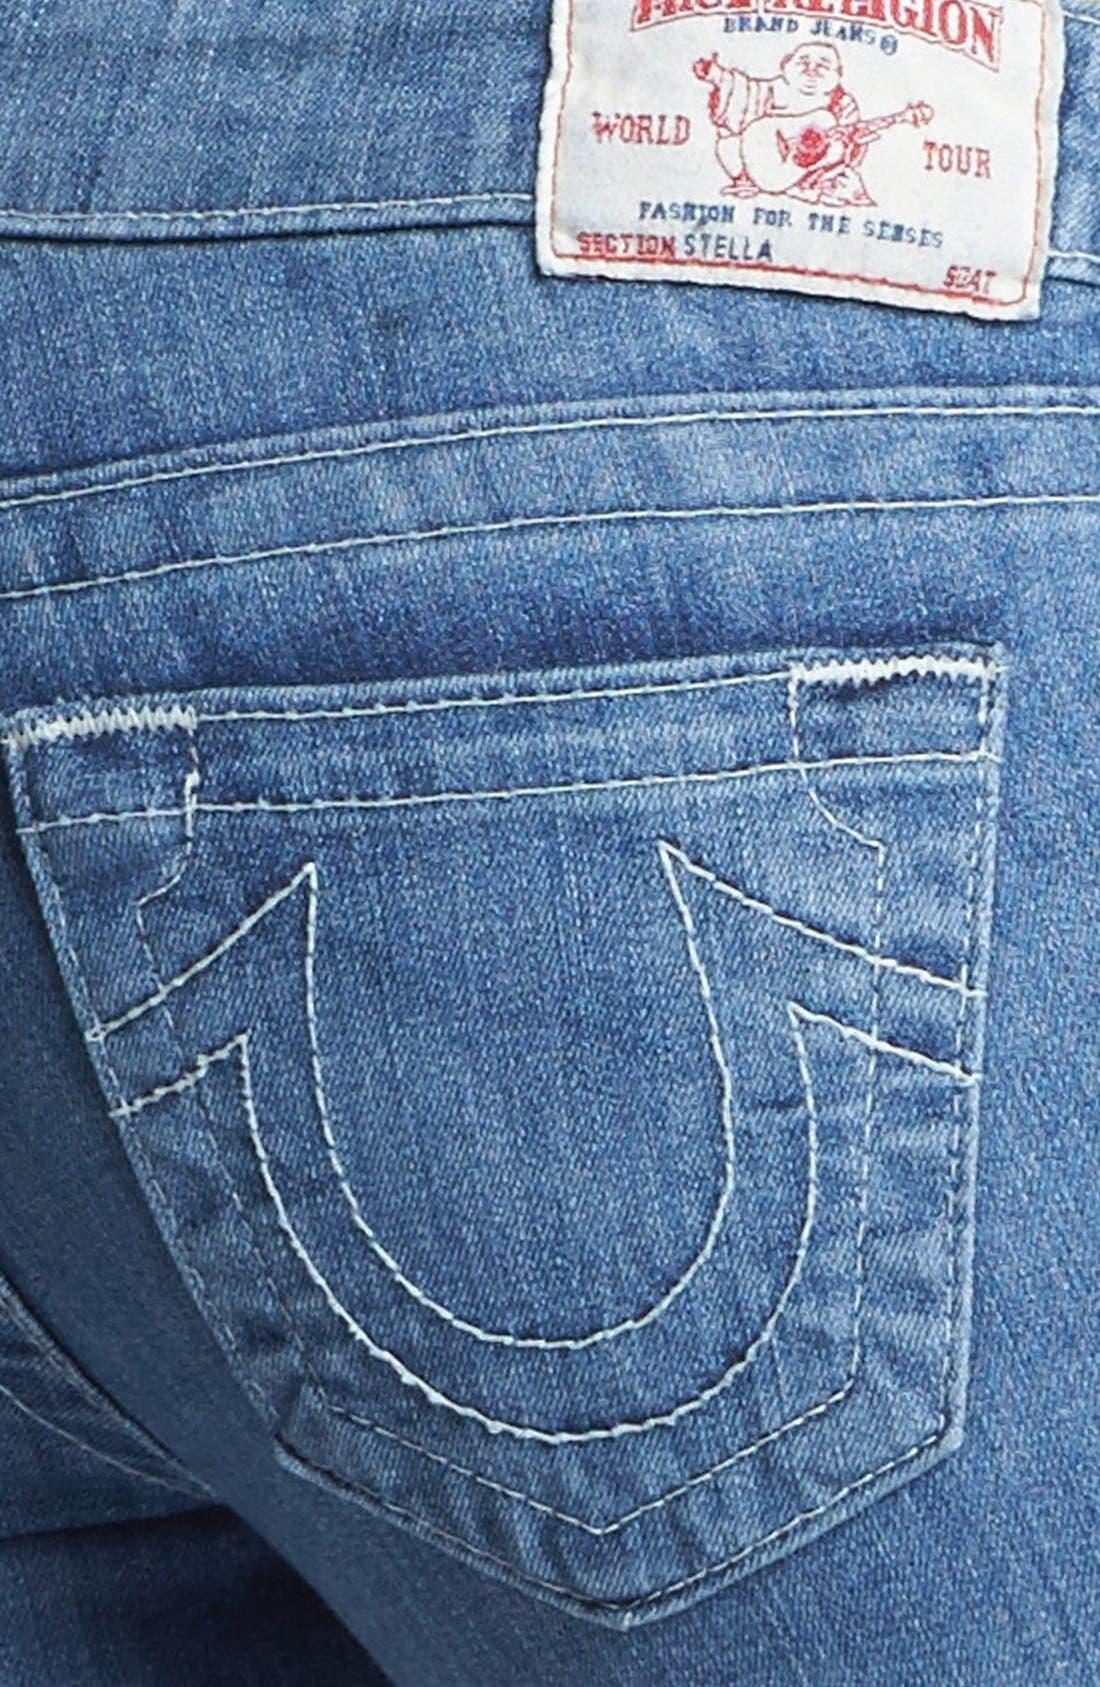 Alternate Image 3  - True Religion Brand Jeans 'Stella' Skinny Jeans (Cabin Creek)